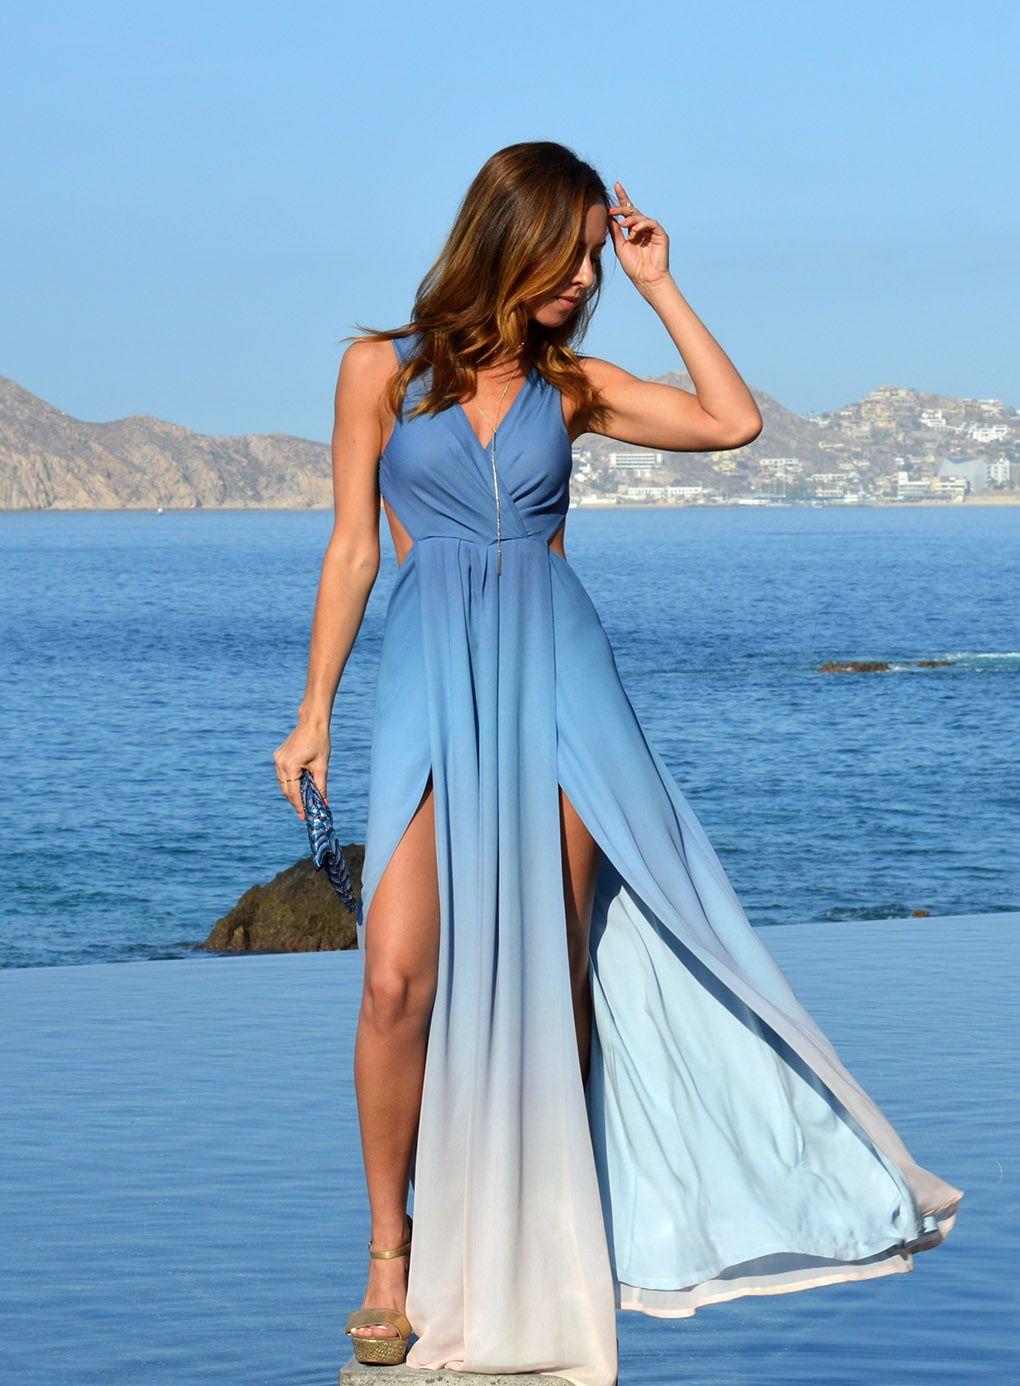 Nine Cutout Maxi Dresses for Summer Dresses, Beach